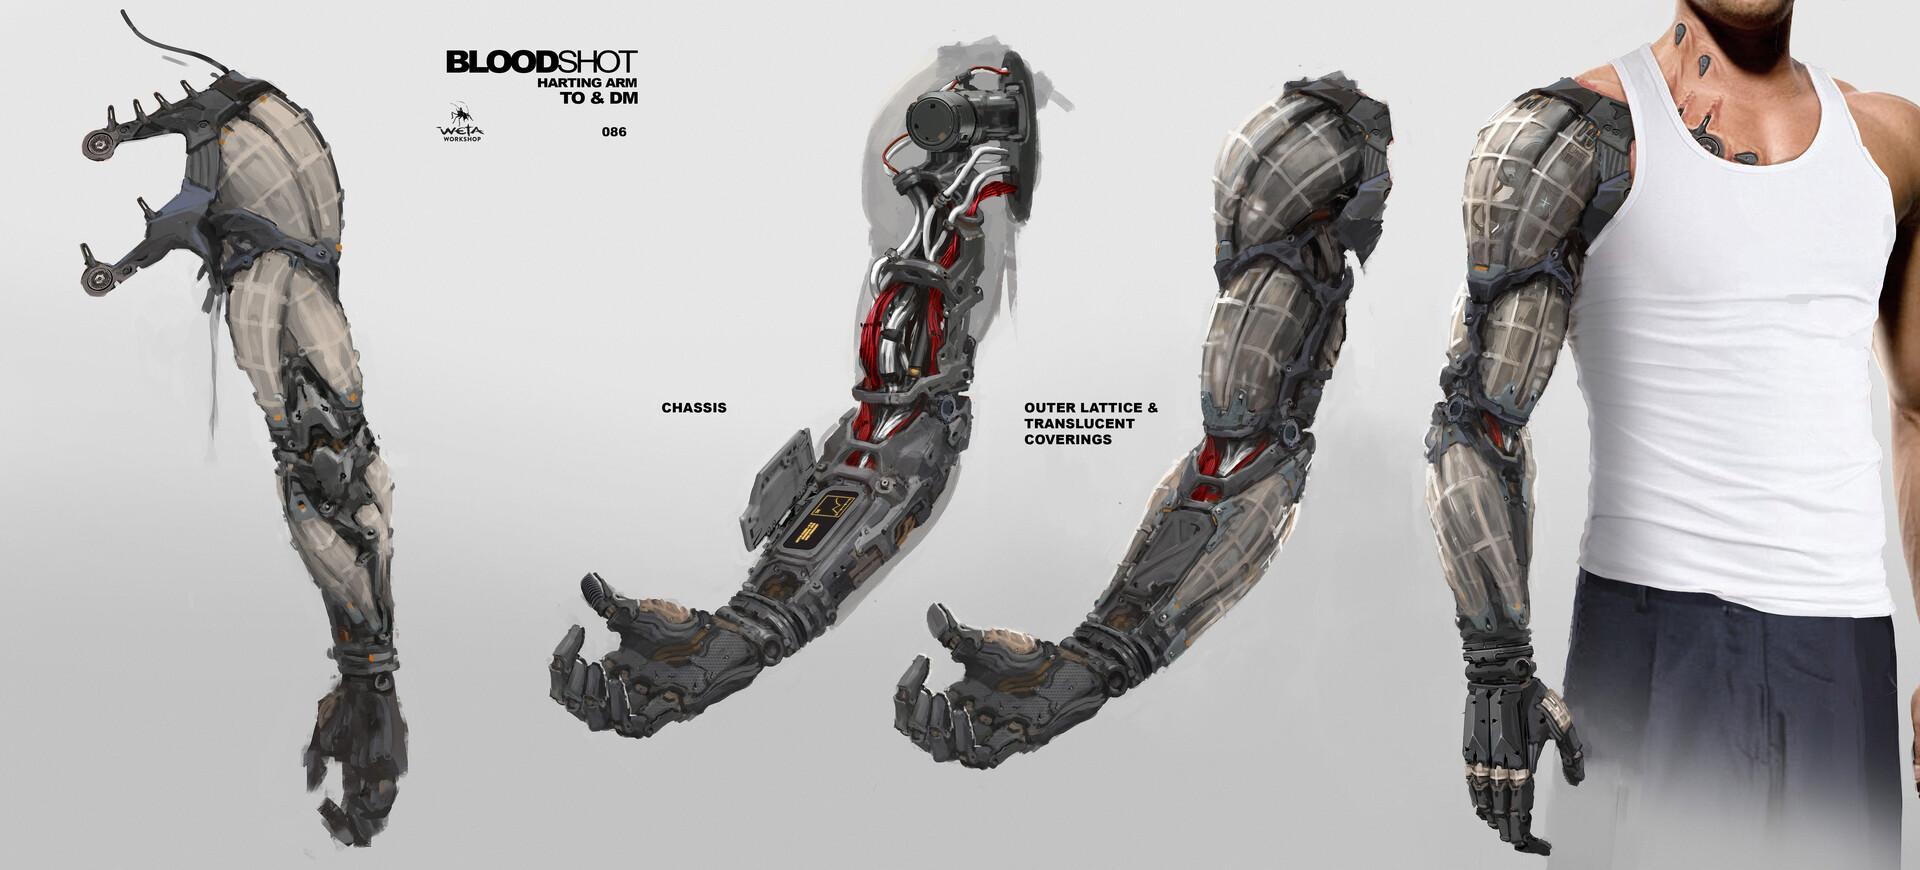 Harting Arm - Artists: Thomas Oates + Dane Madgwick